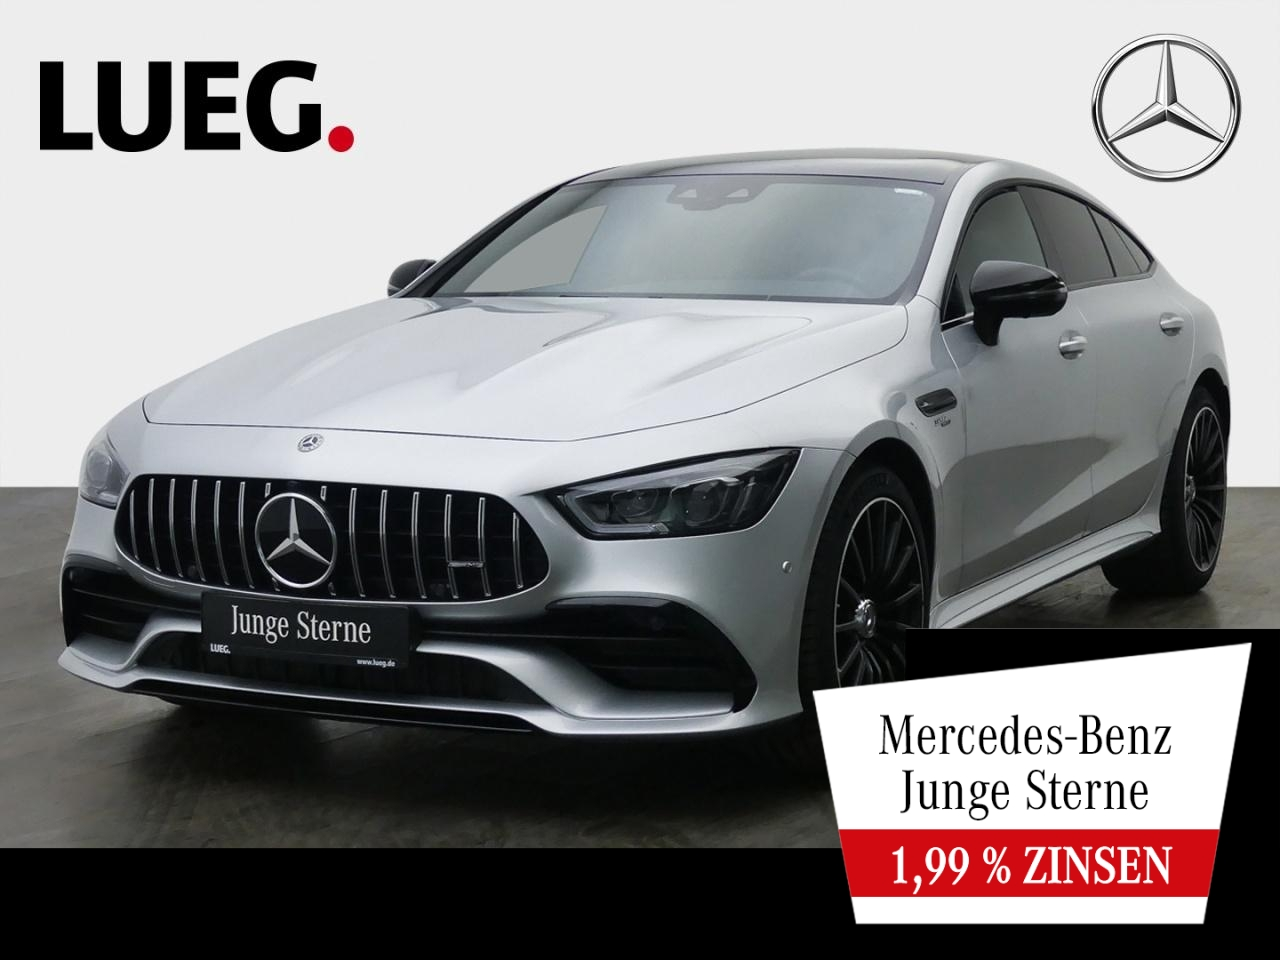 Mercedes-Benz AMG GT 43 4M+ COM+Pano+Burm+Mbeam+Dstr+Sthzg+360, Jahr 2019, Benzin